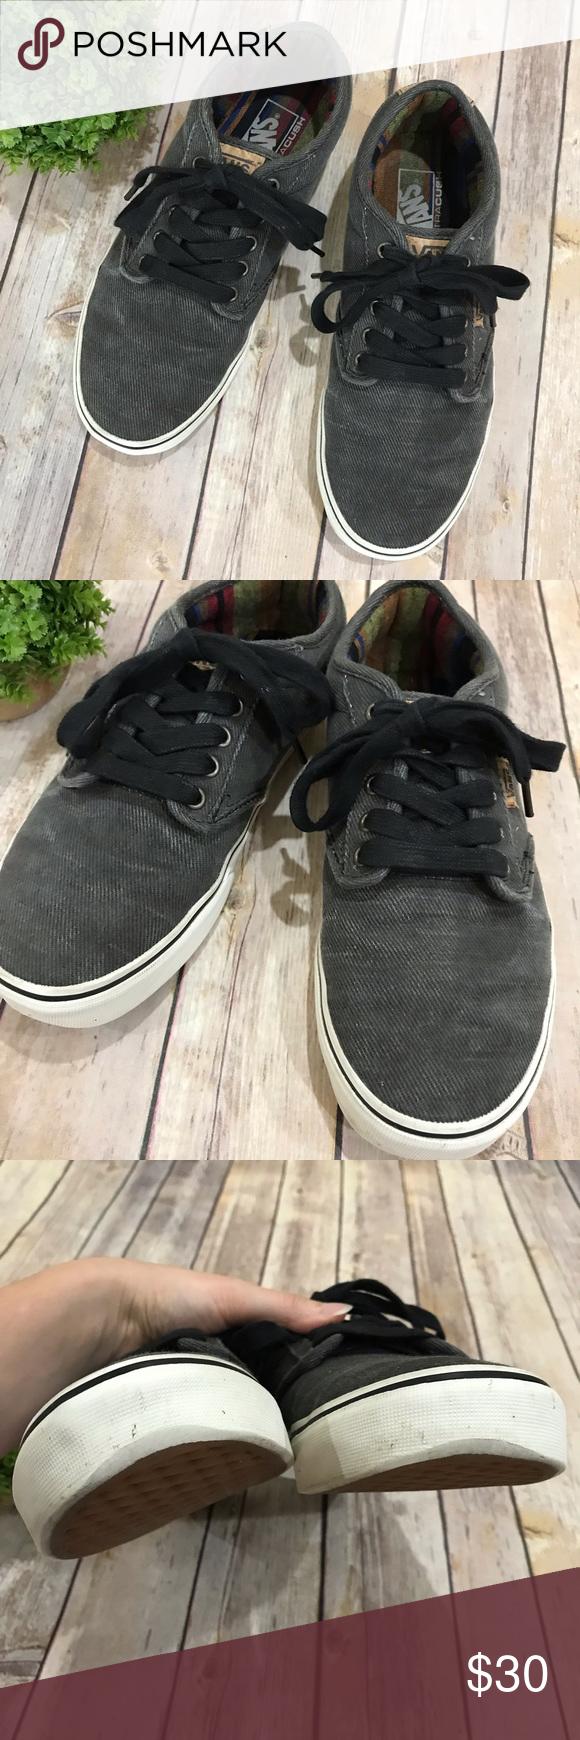 Vans { Men's Ultracush Gray Corduroy Sneakers 8.5 These